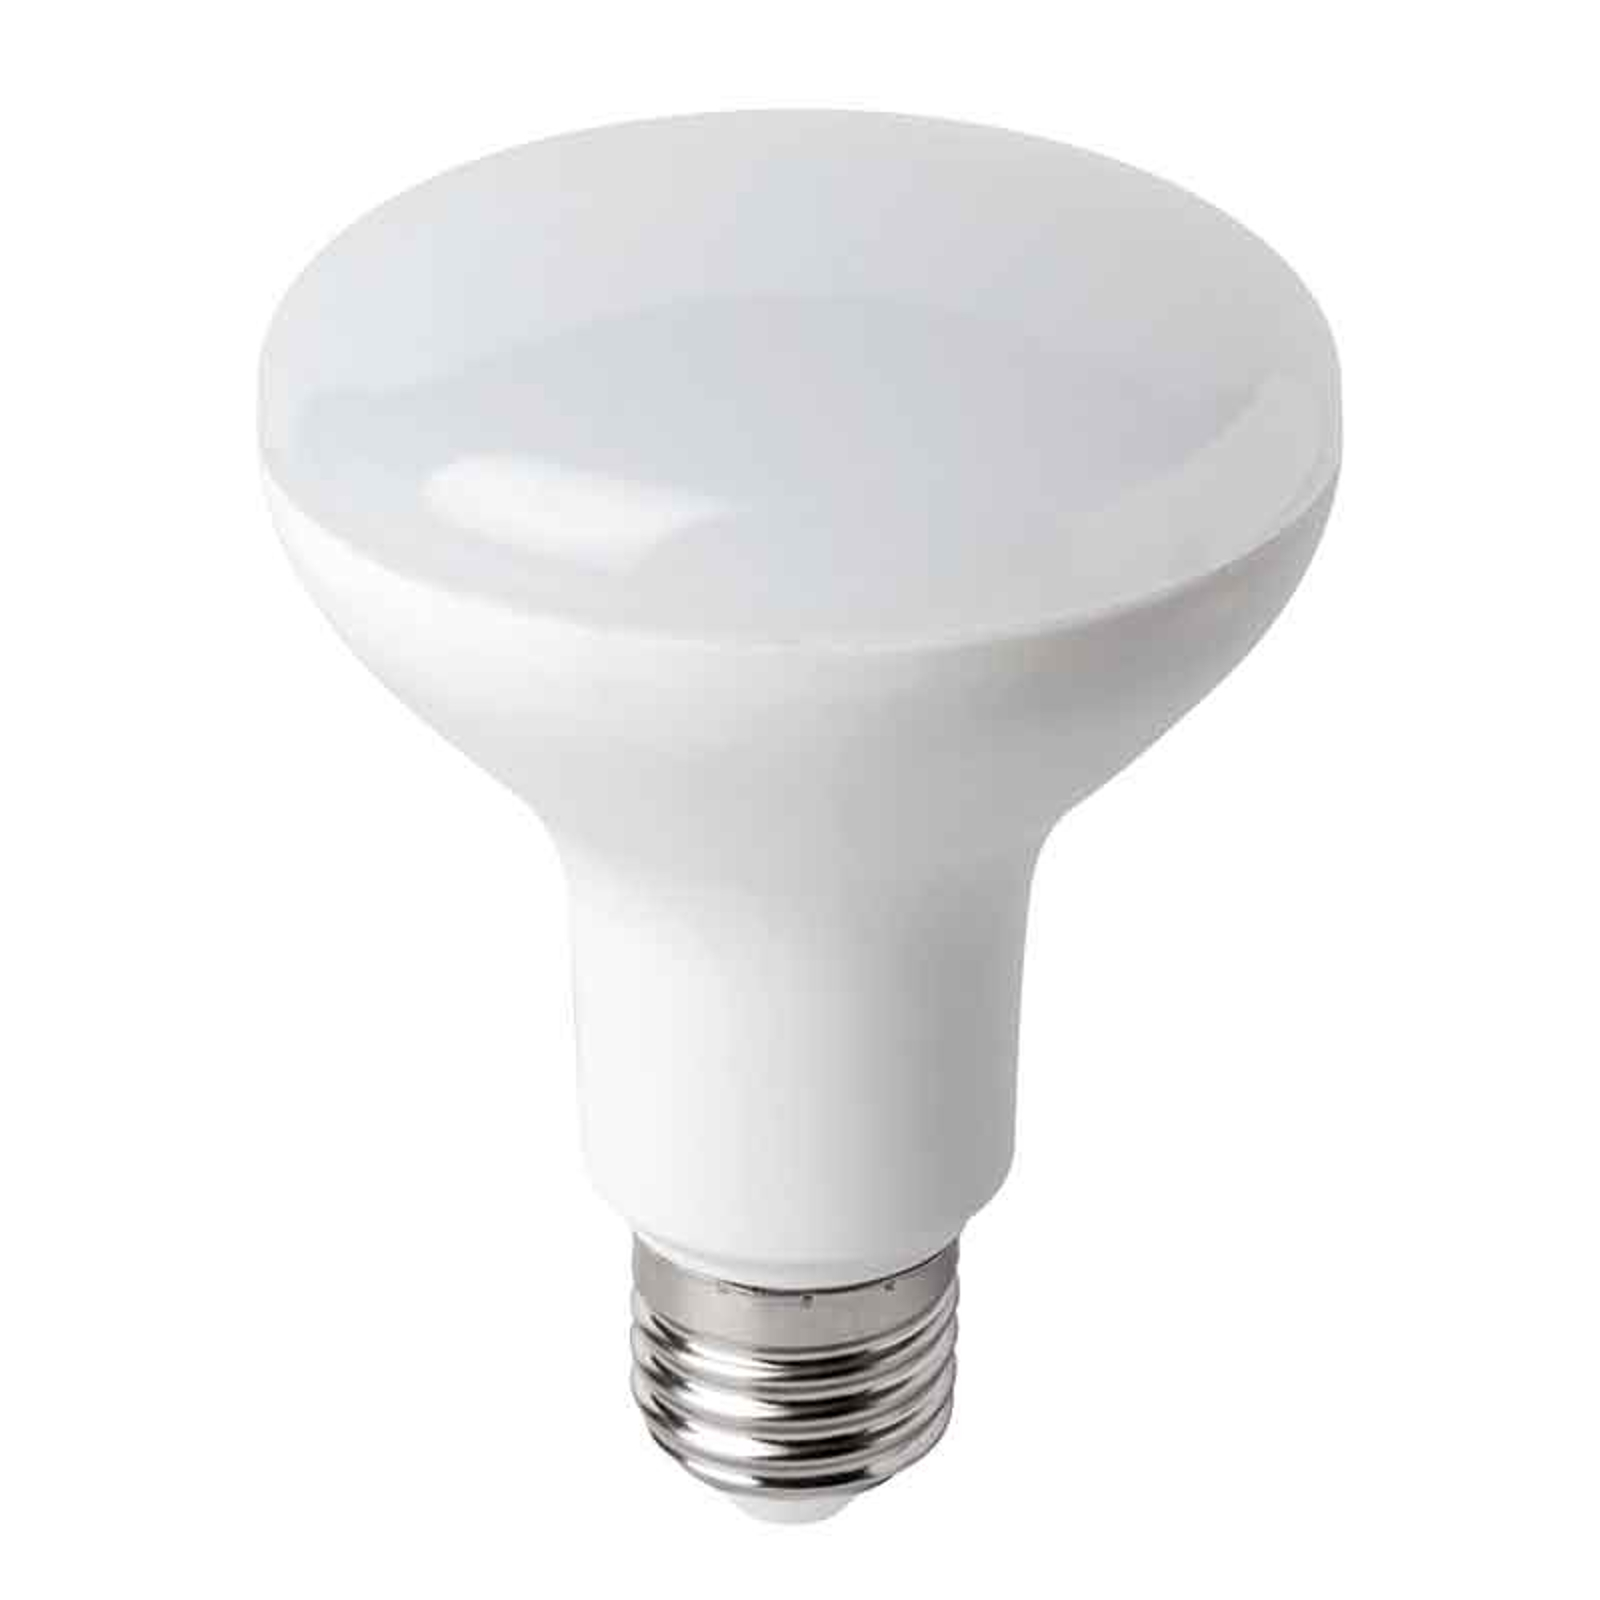 LED-reflektor E27 R80 8,5 W 2800 K 750 lumen